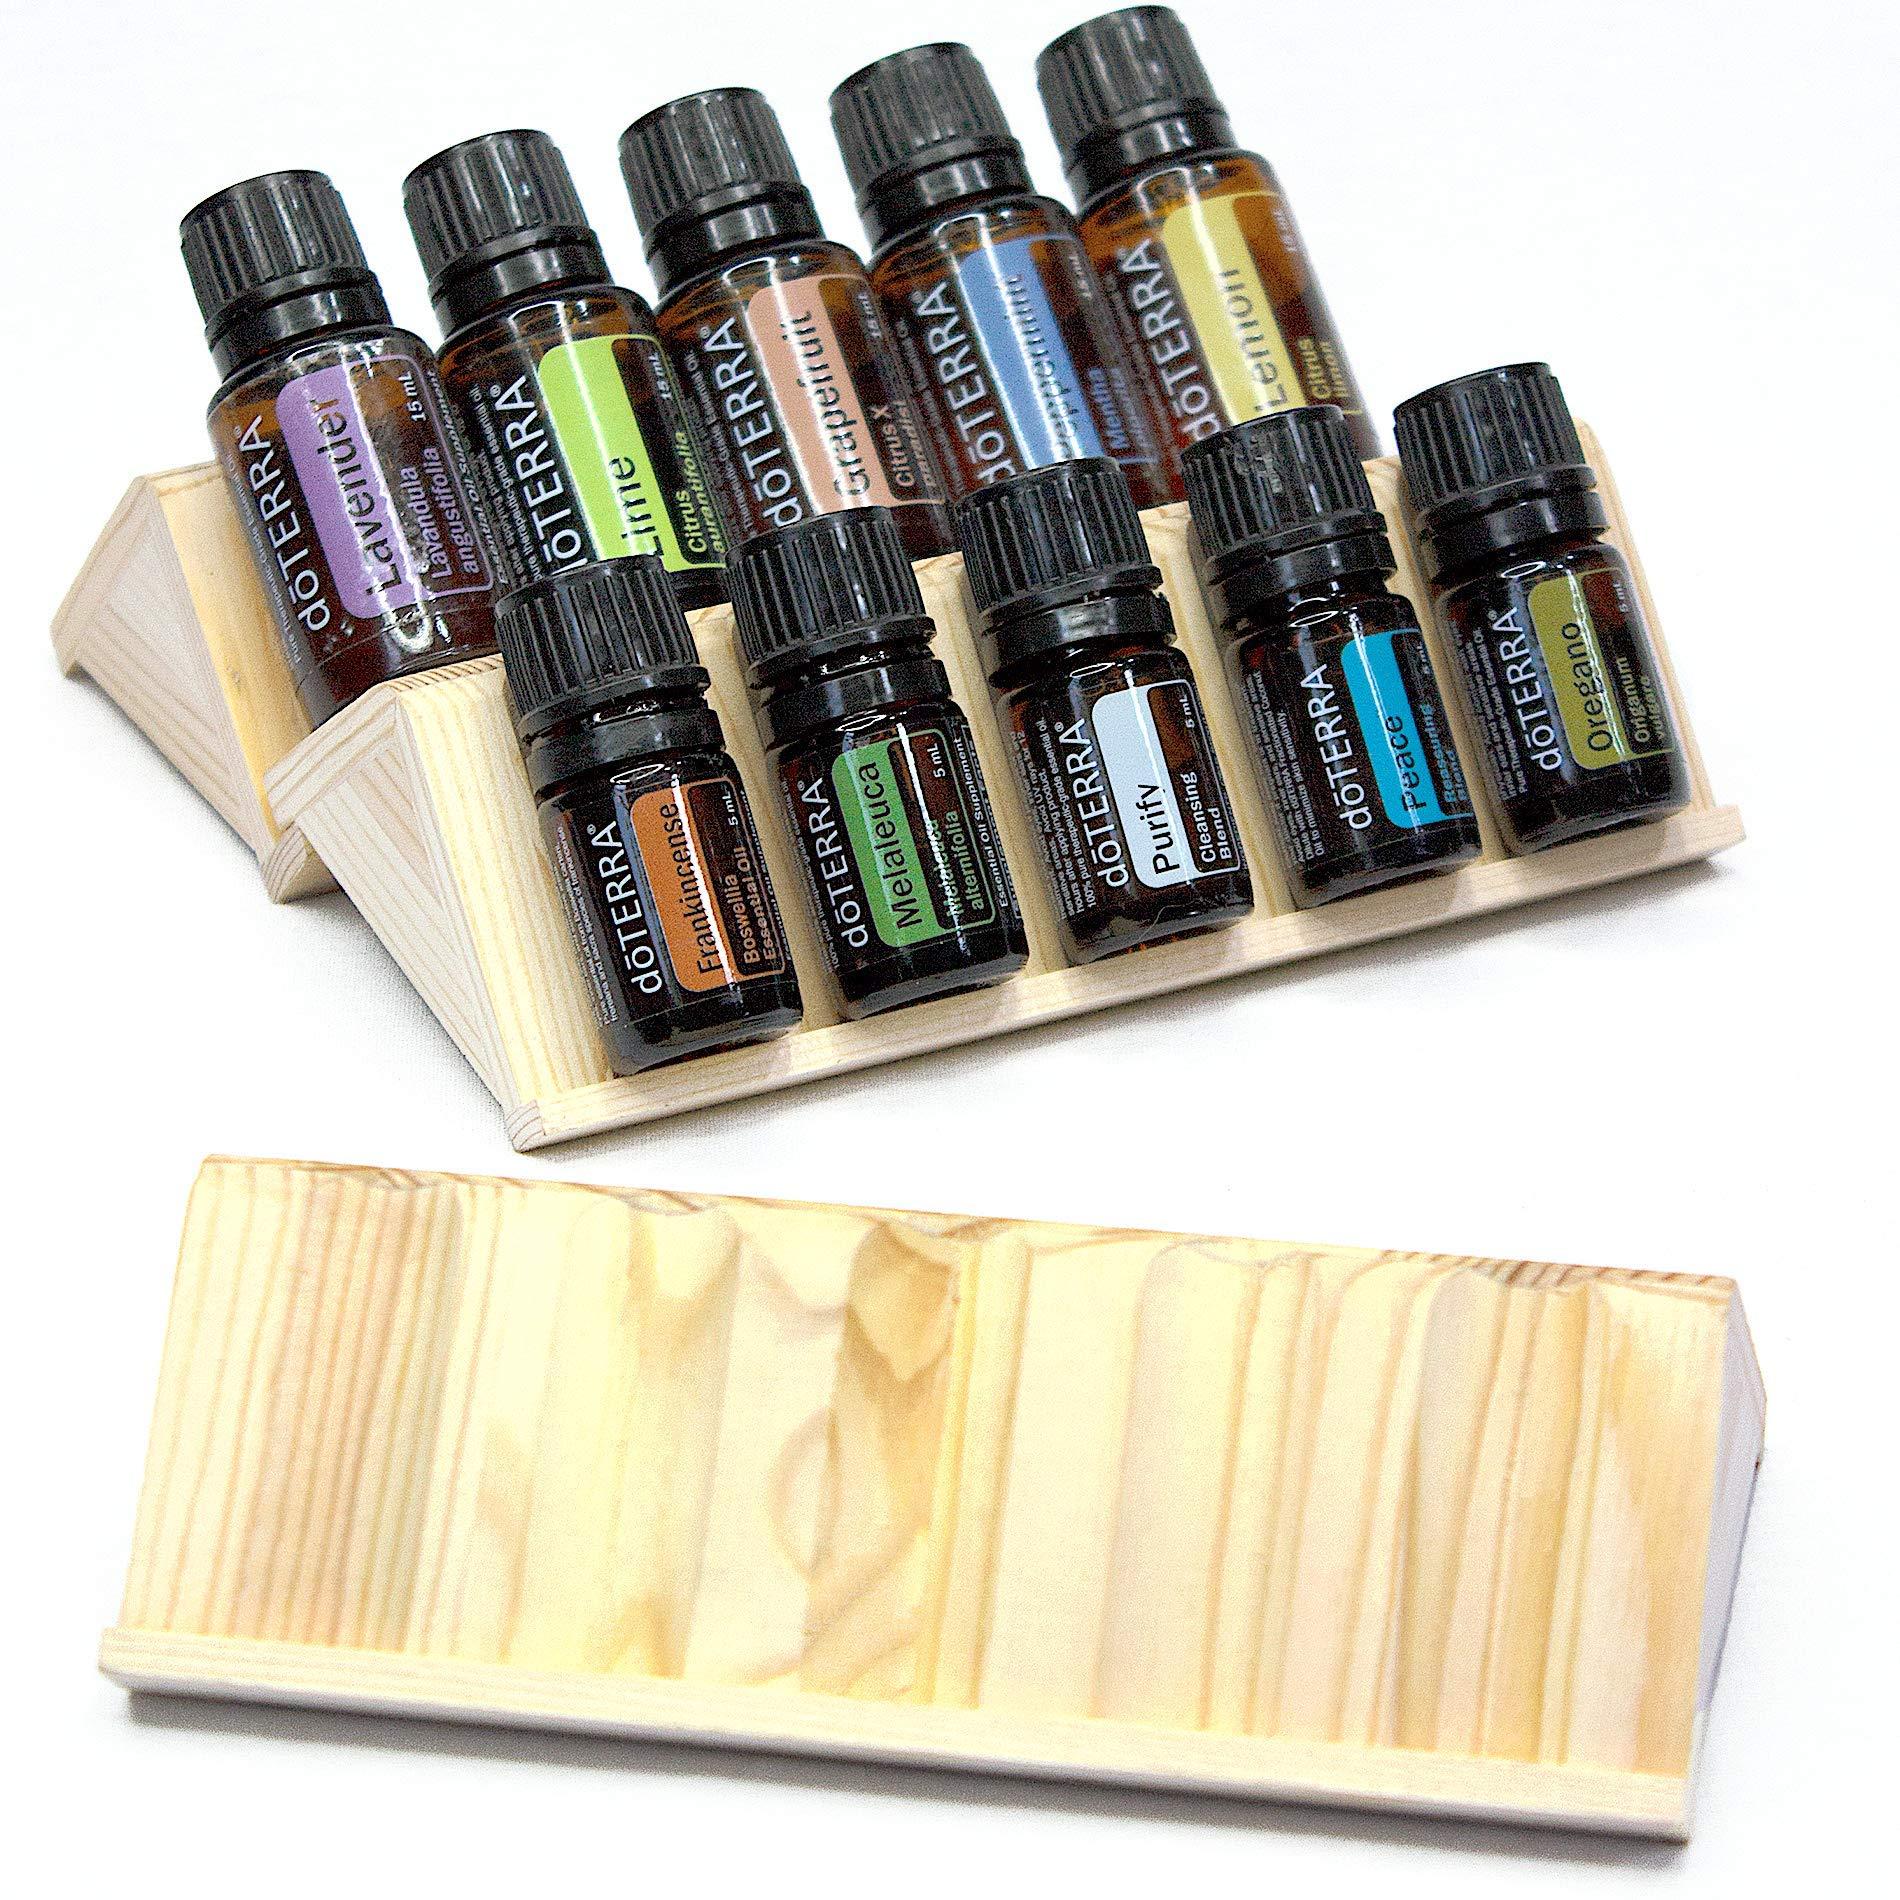 Essential Oils Storage Set - 3pc Wooden Display Racks that Holds 15 Oil Bottles (5mL - 30mL) - Expandable Holders for Organizing & Storing Oils